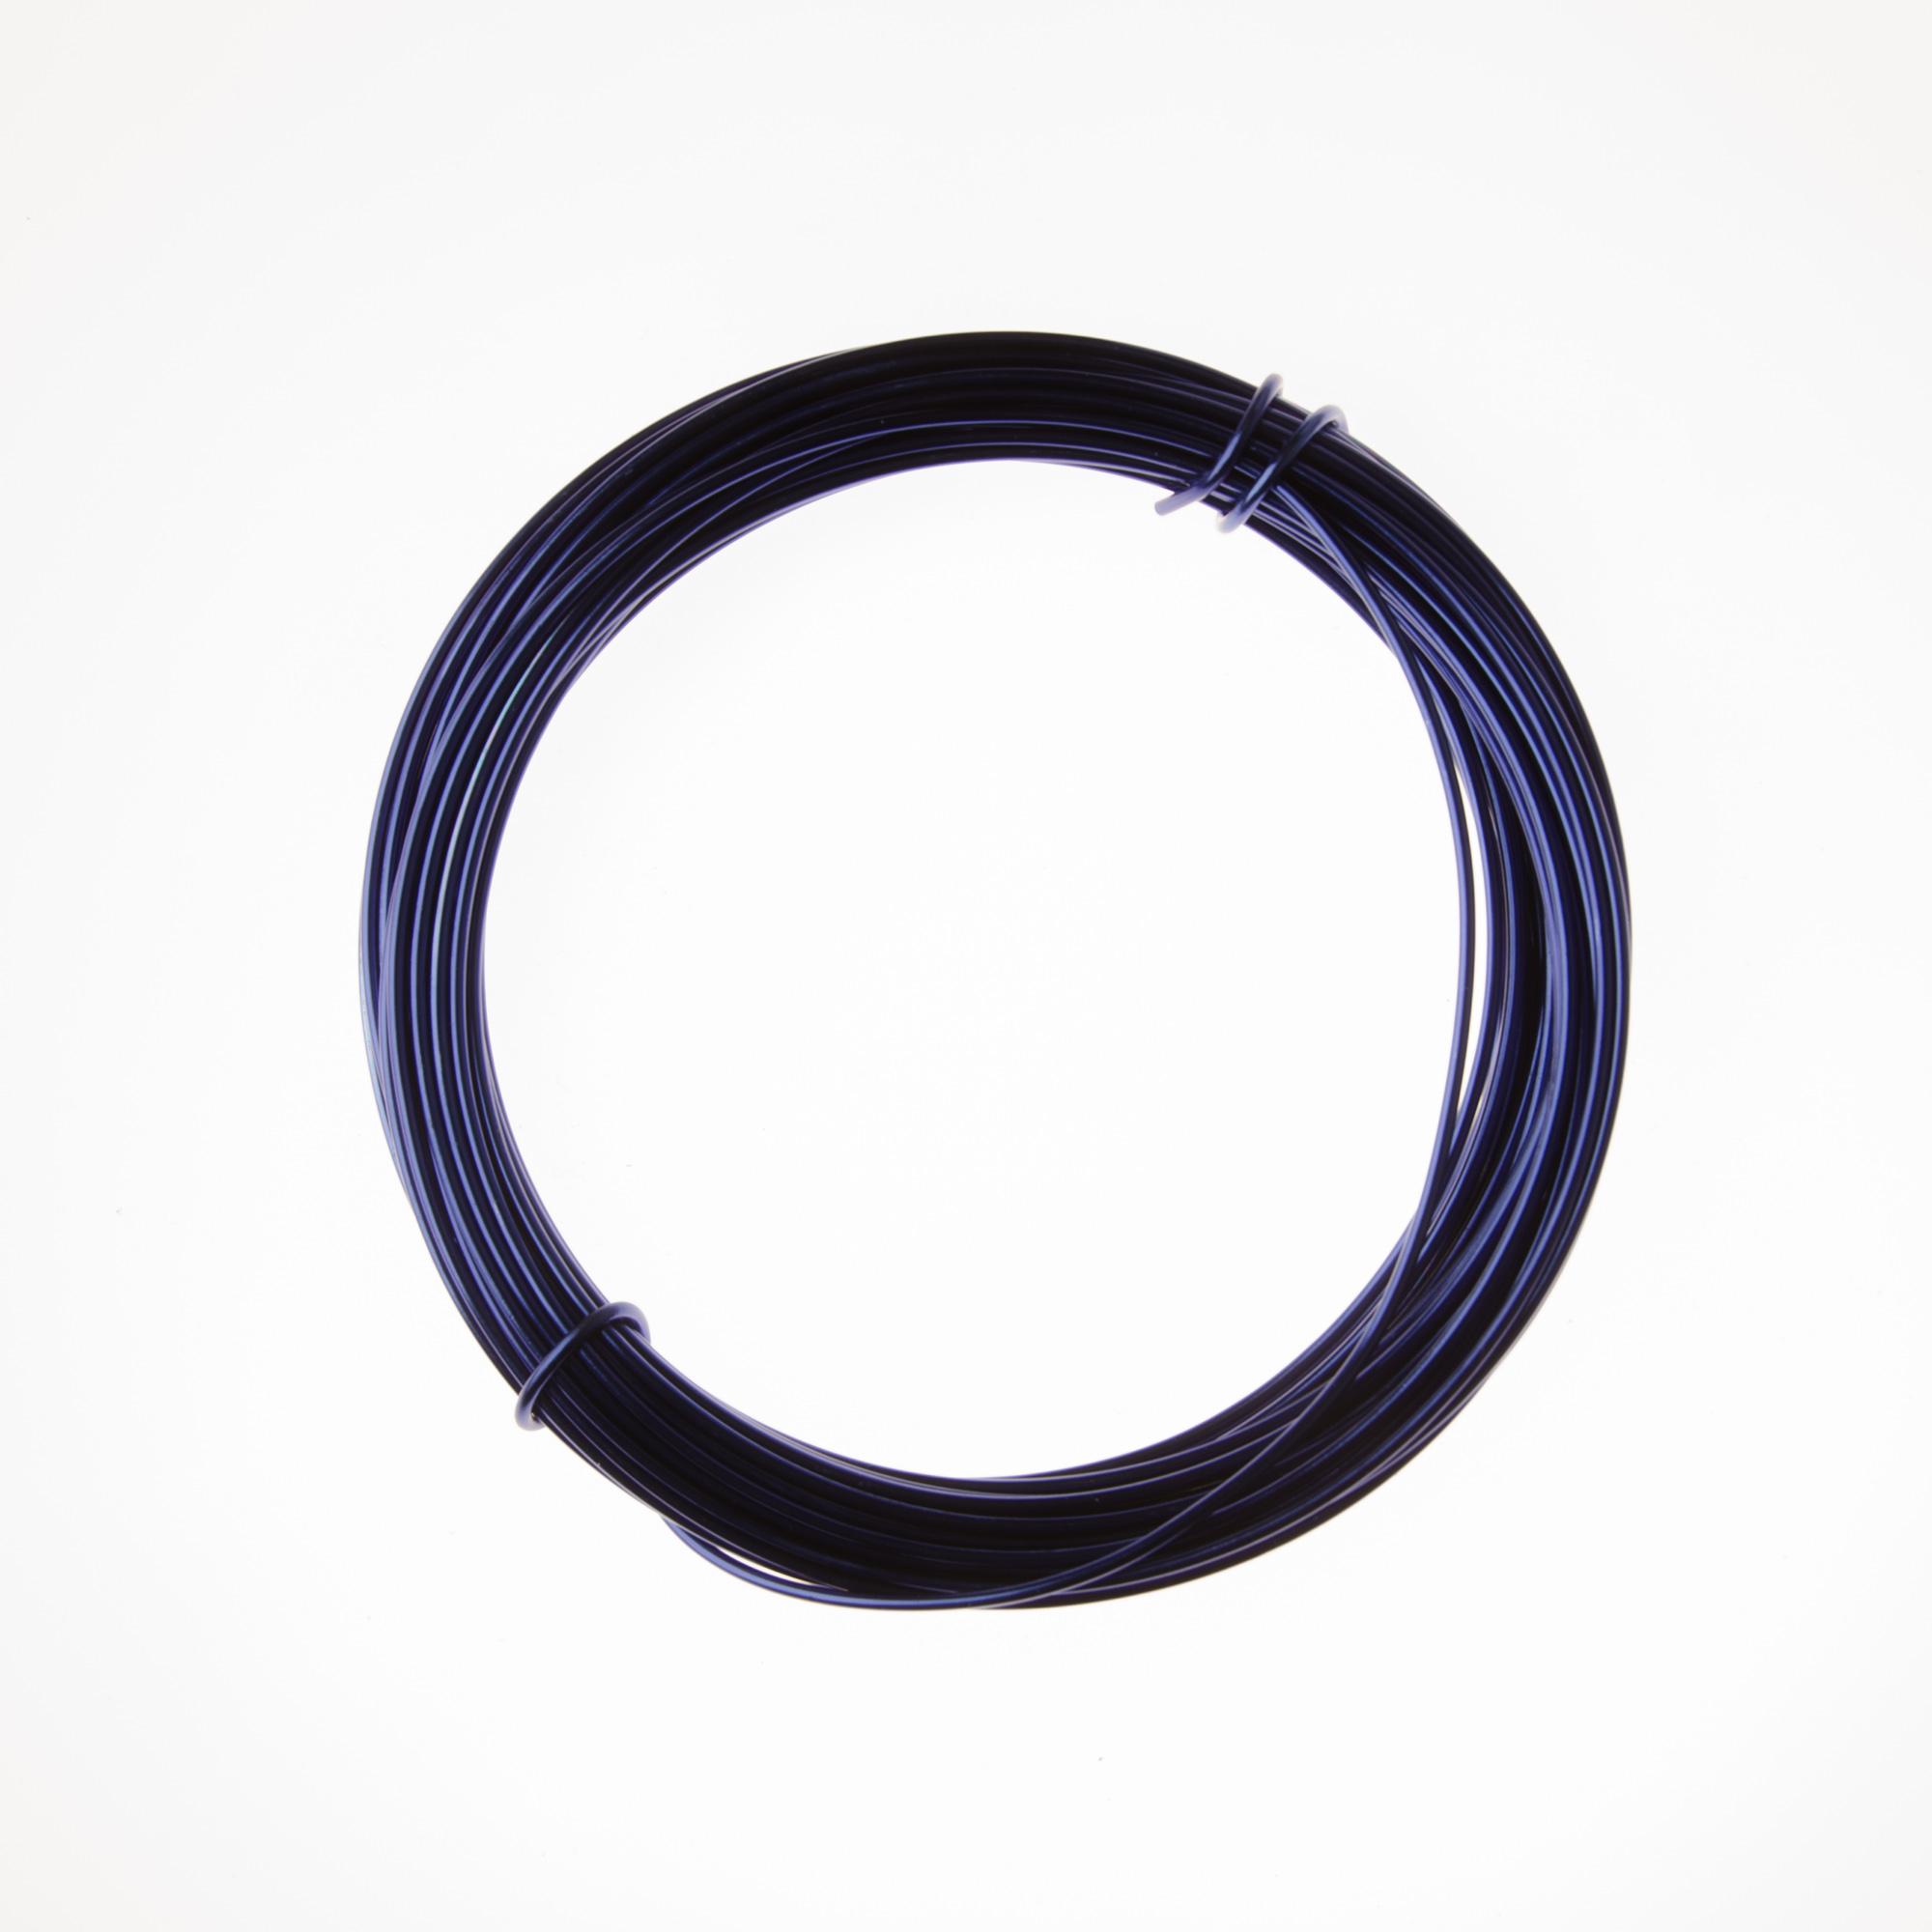 Cool Aluminum Wire 12 Gauge Contemporary - Wiring Schematics and ...